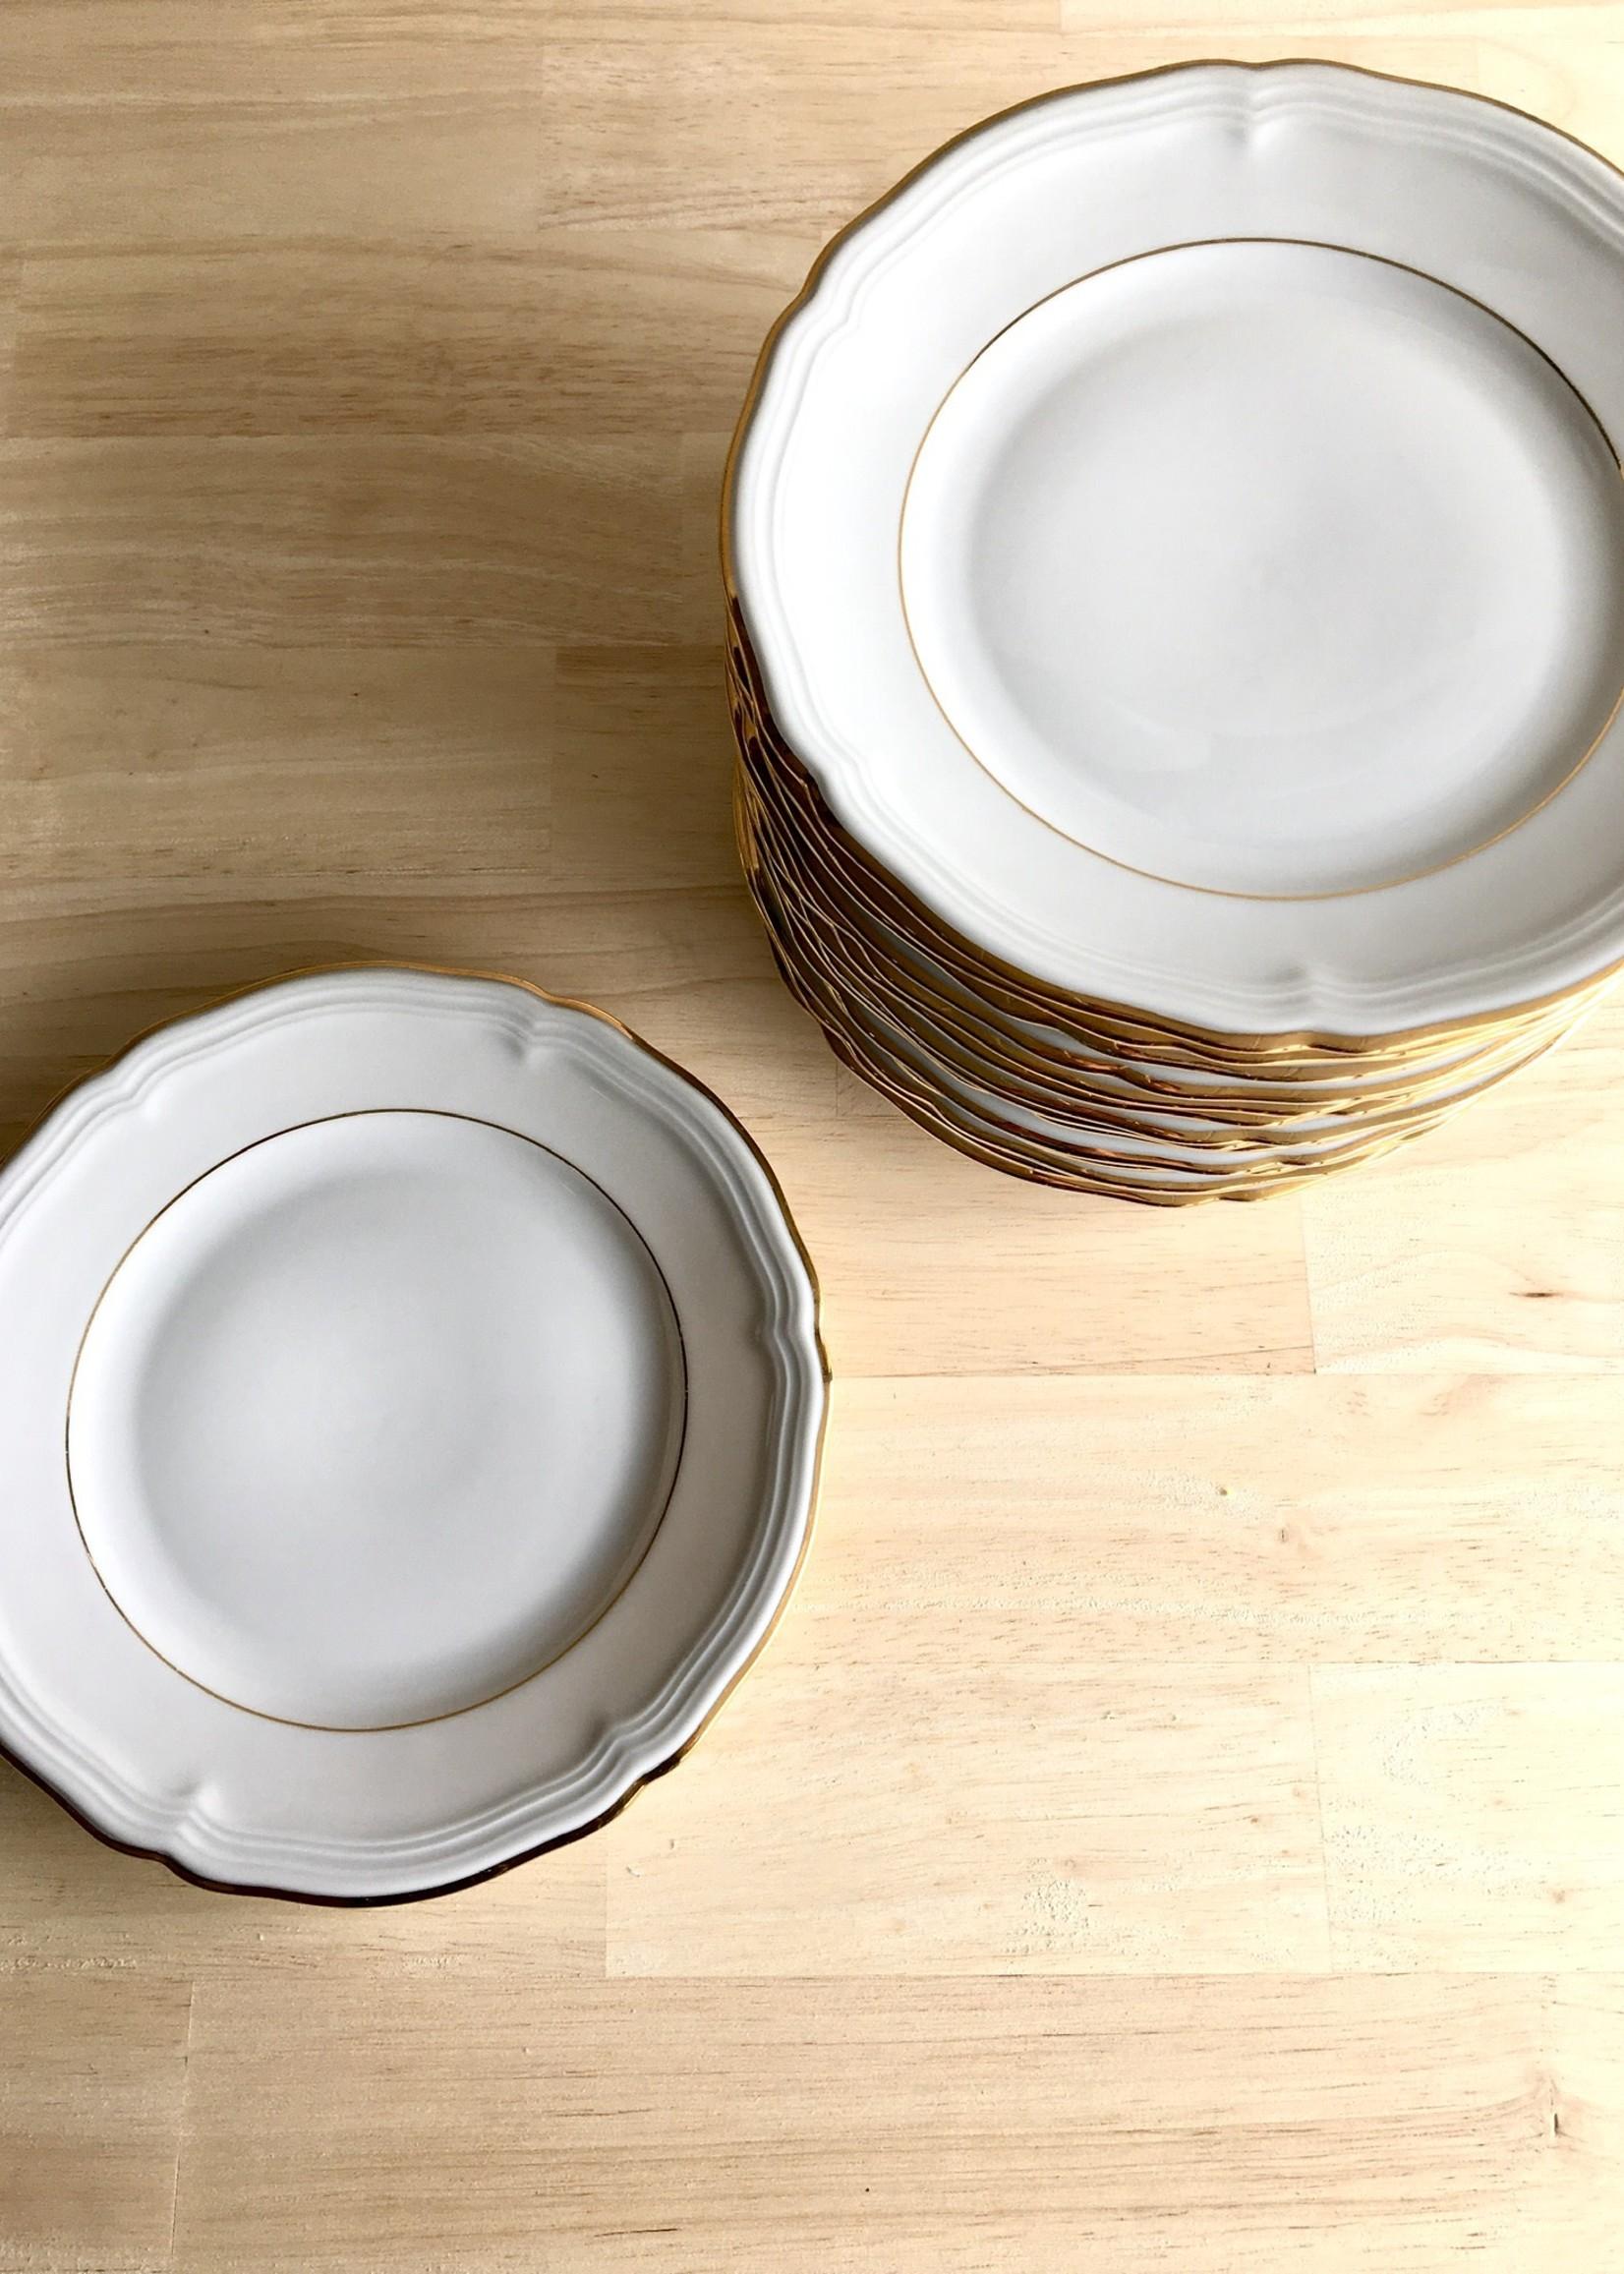 Bavarian porcelain dessert plates model Marie Luise White and gold